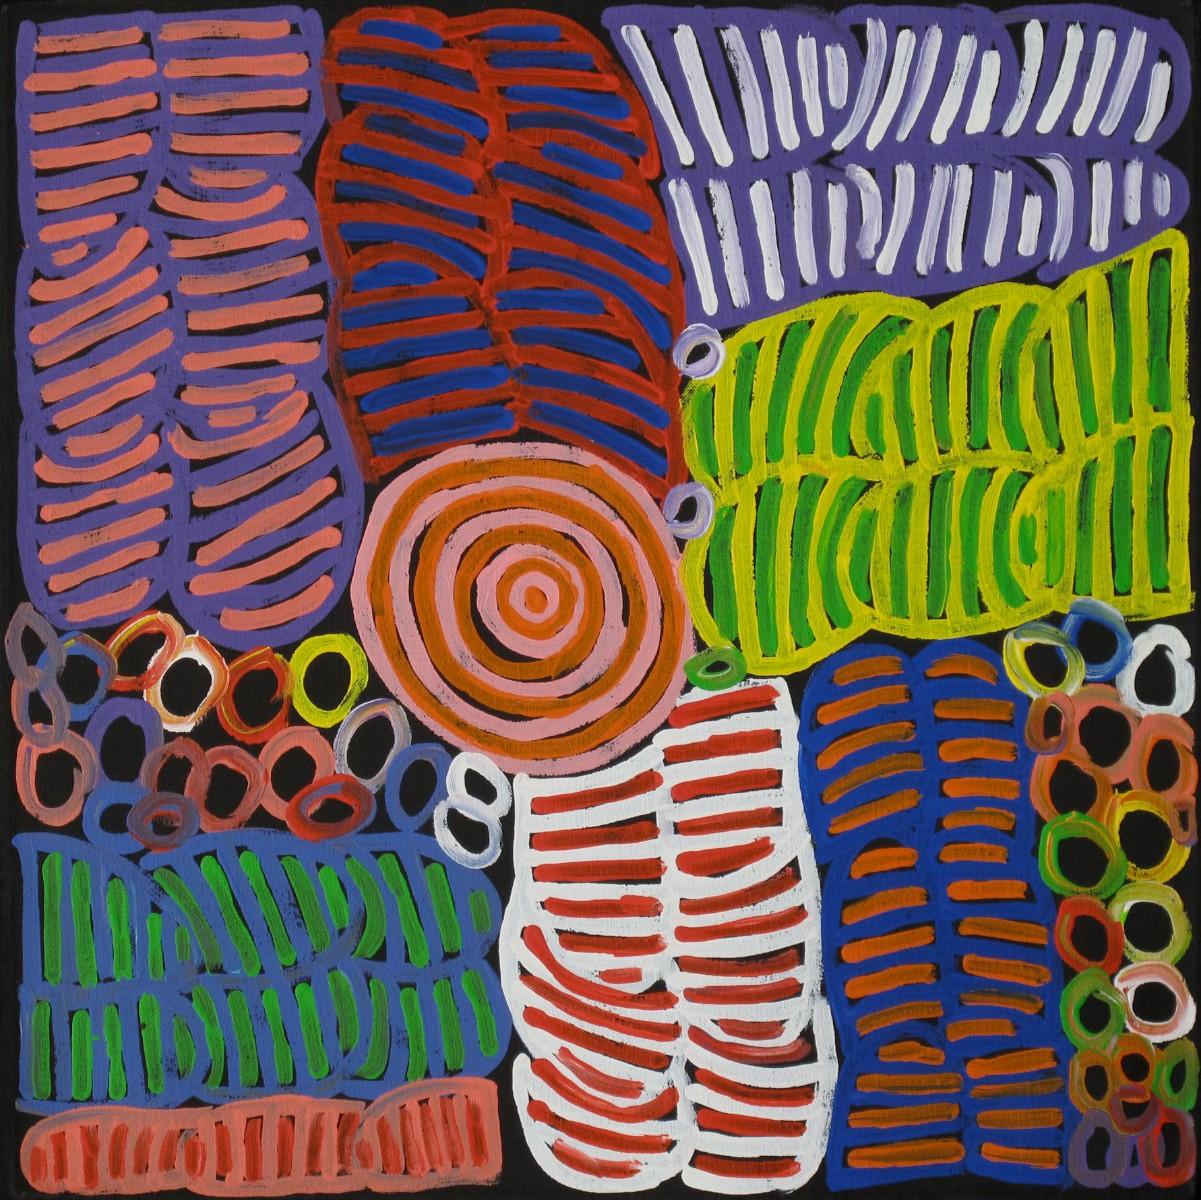 Betty Mbitjana. Awalye and Bush Melon Seed. 60cm x 60cm #11164